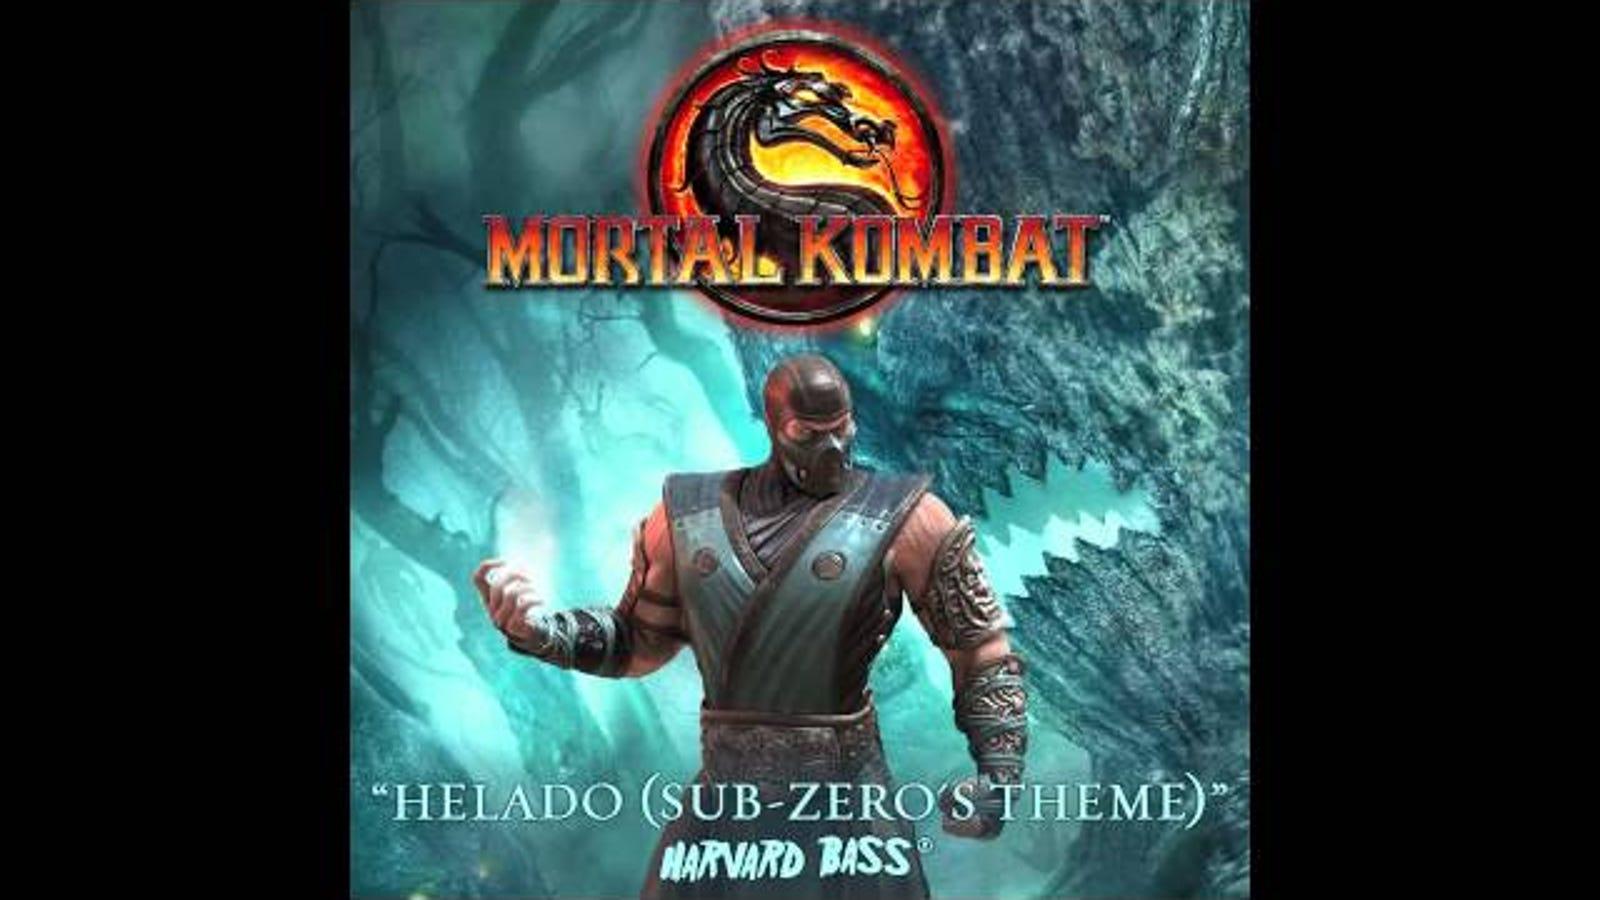 The New Mortal Kombat Spawns A New Electronic Album